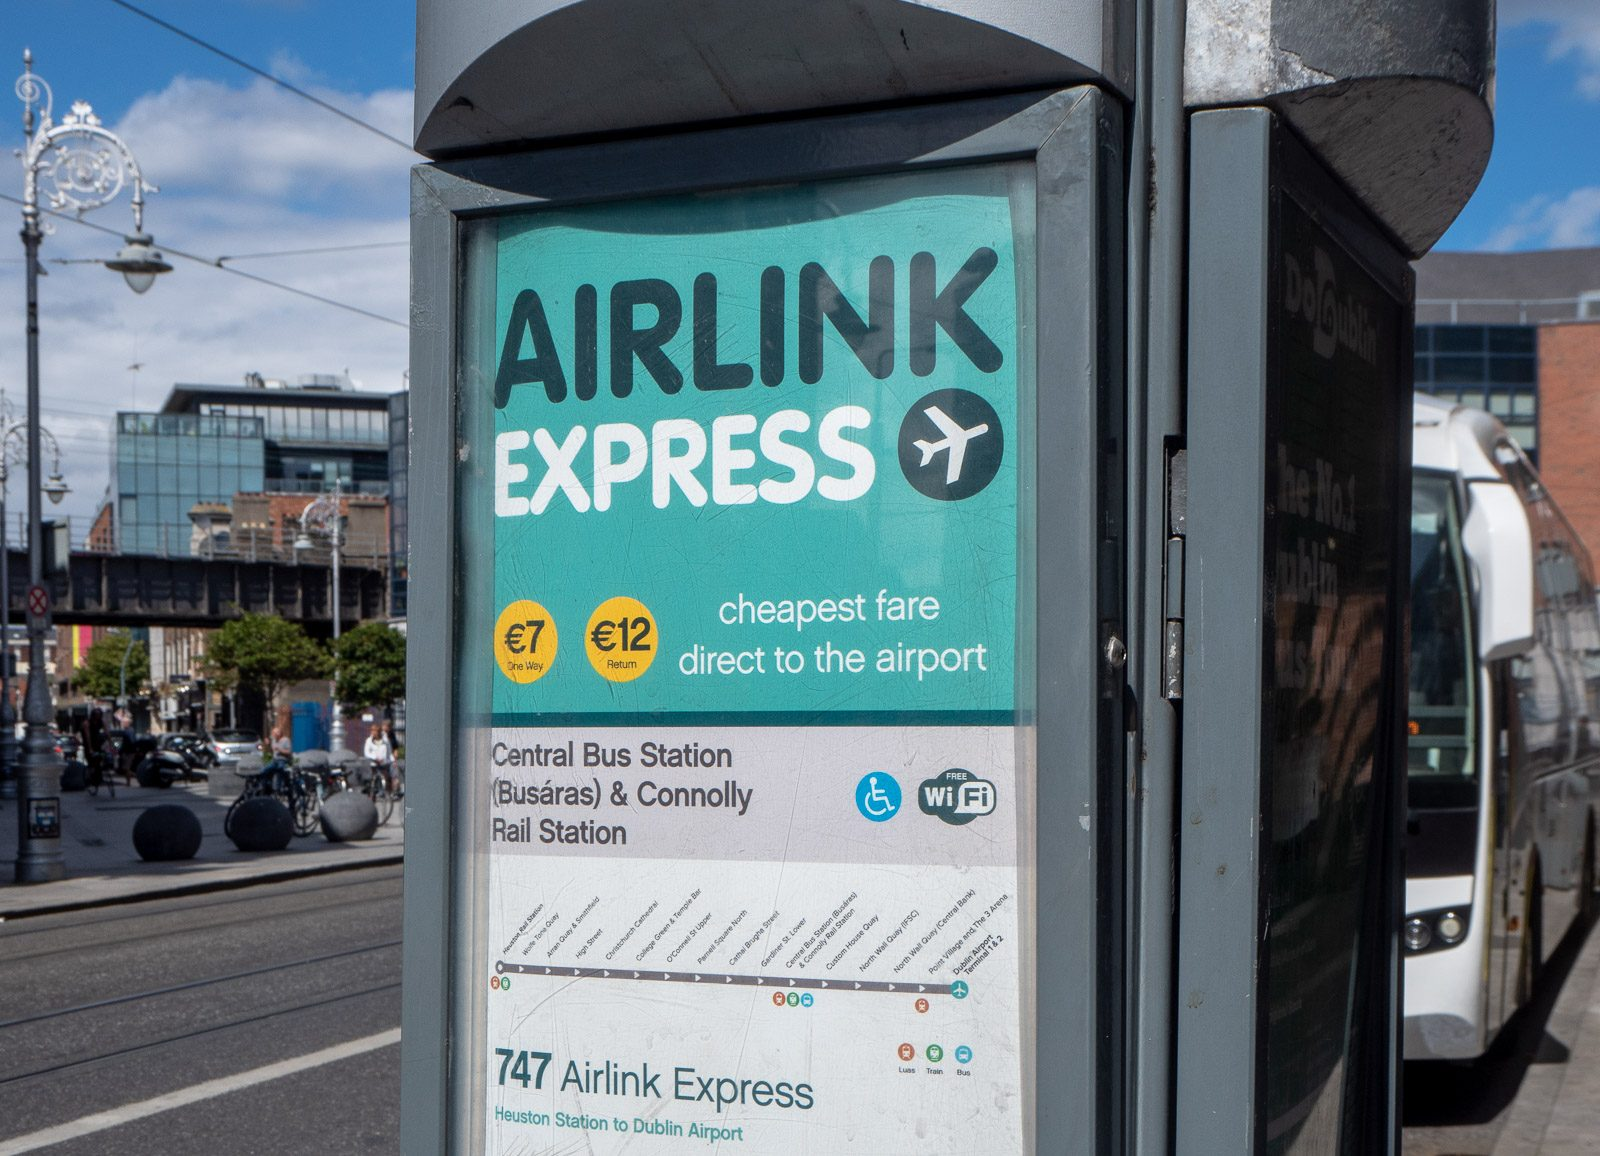 Airlink Express Dublin Skotlanti, Belfast, Dublin kustannukset